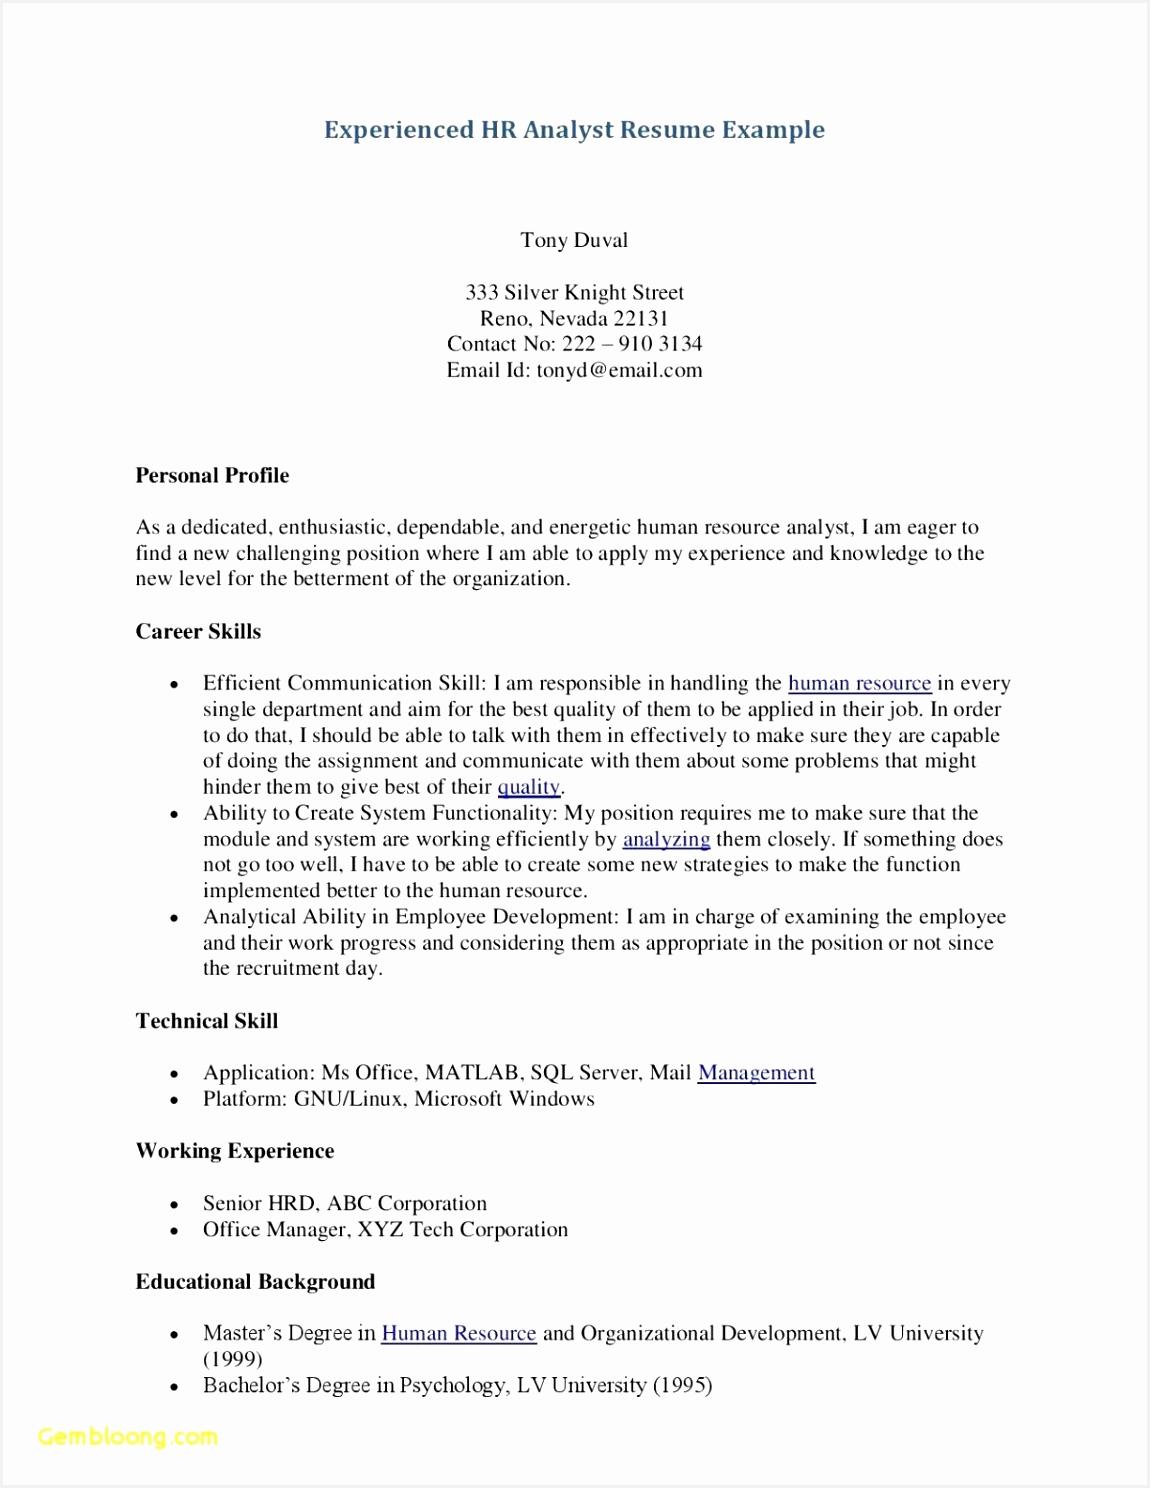 23 Unique Server Resume Template Server Resume Template 14881150csrfw